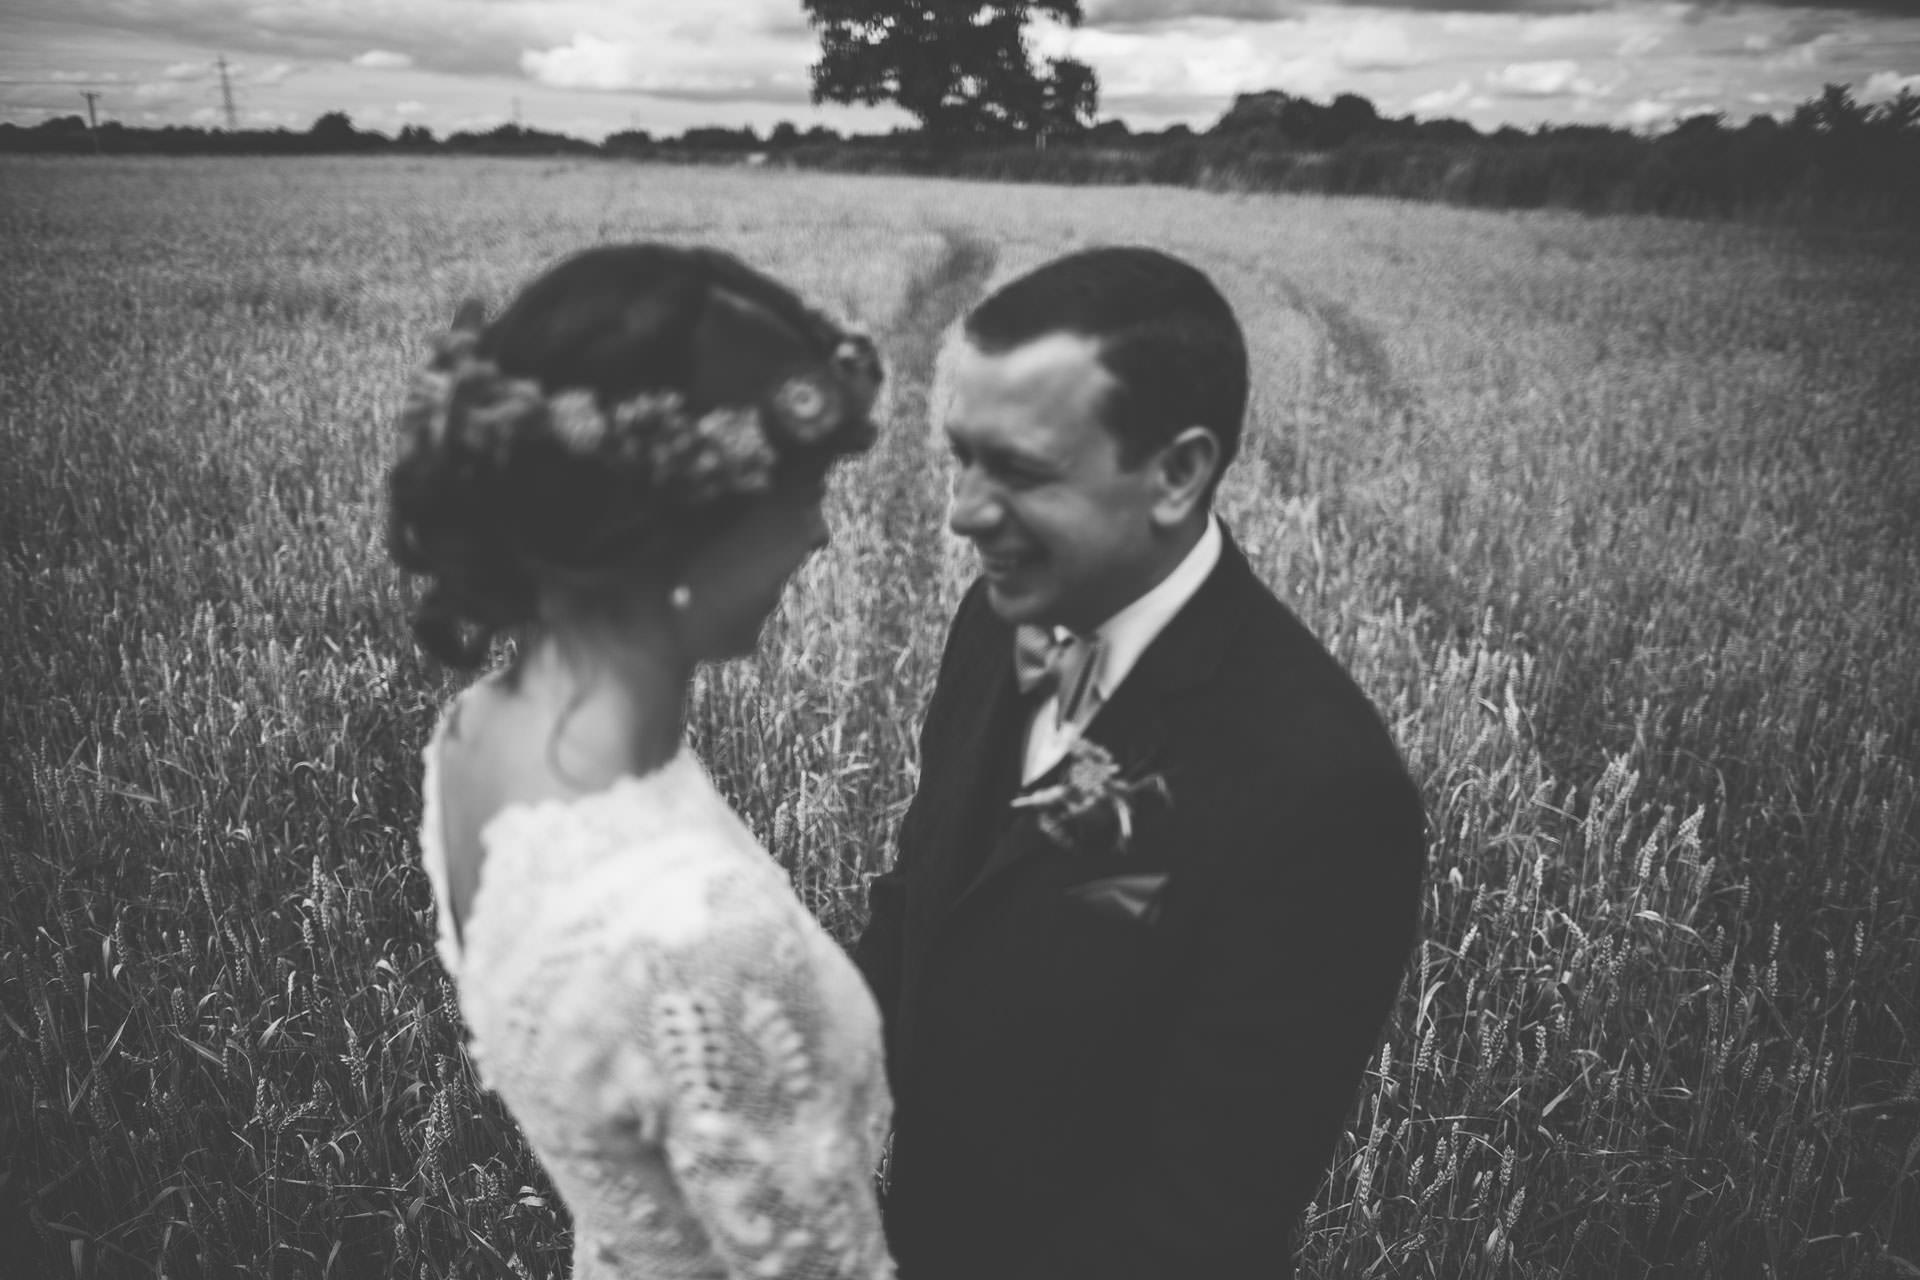 winterbourne-medieval-barn-wedding-photography-emma-andrew-82